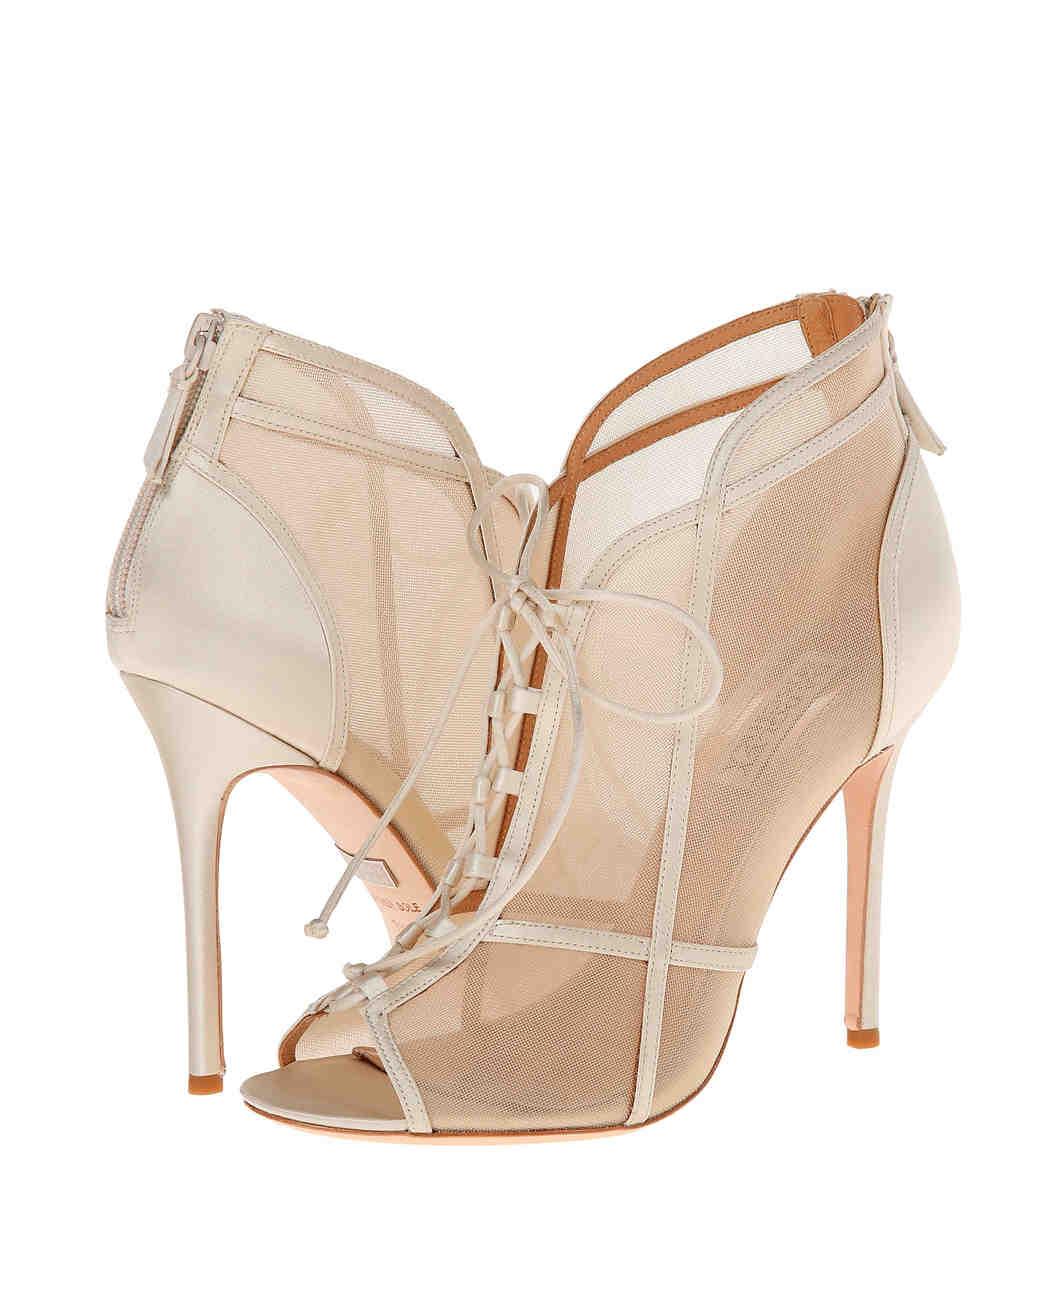 mesh-wedding-shoes-badgley-mischka-foley-0315.jpg